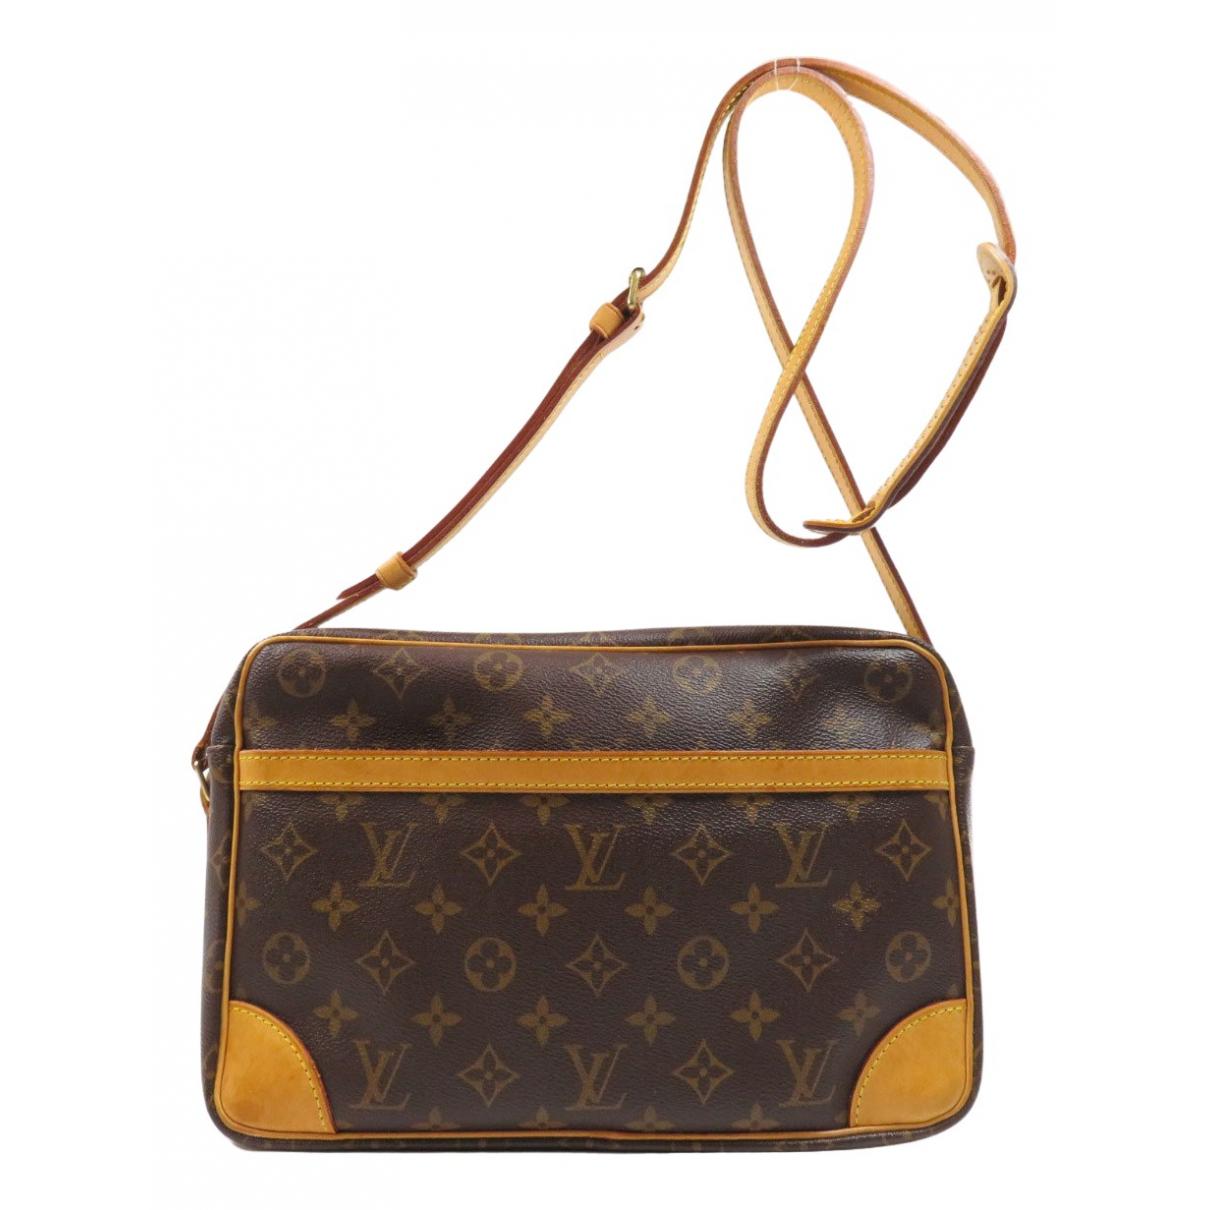 Louis Vuitton - Sac a main Trocadero pour femme en toile - marron